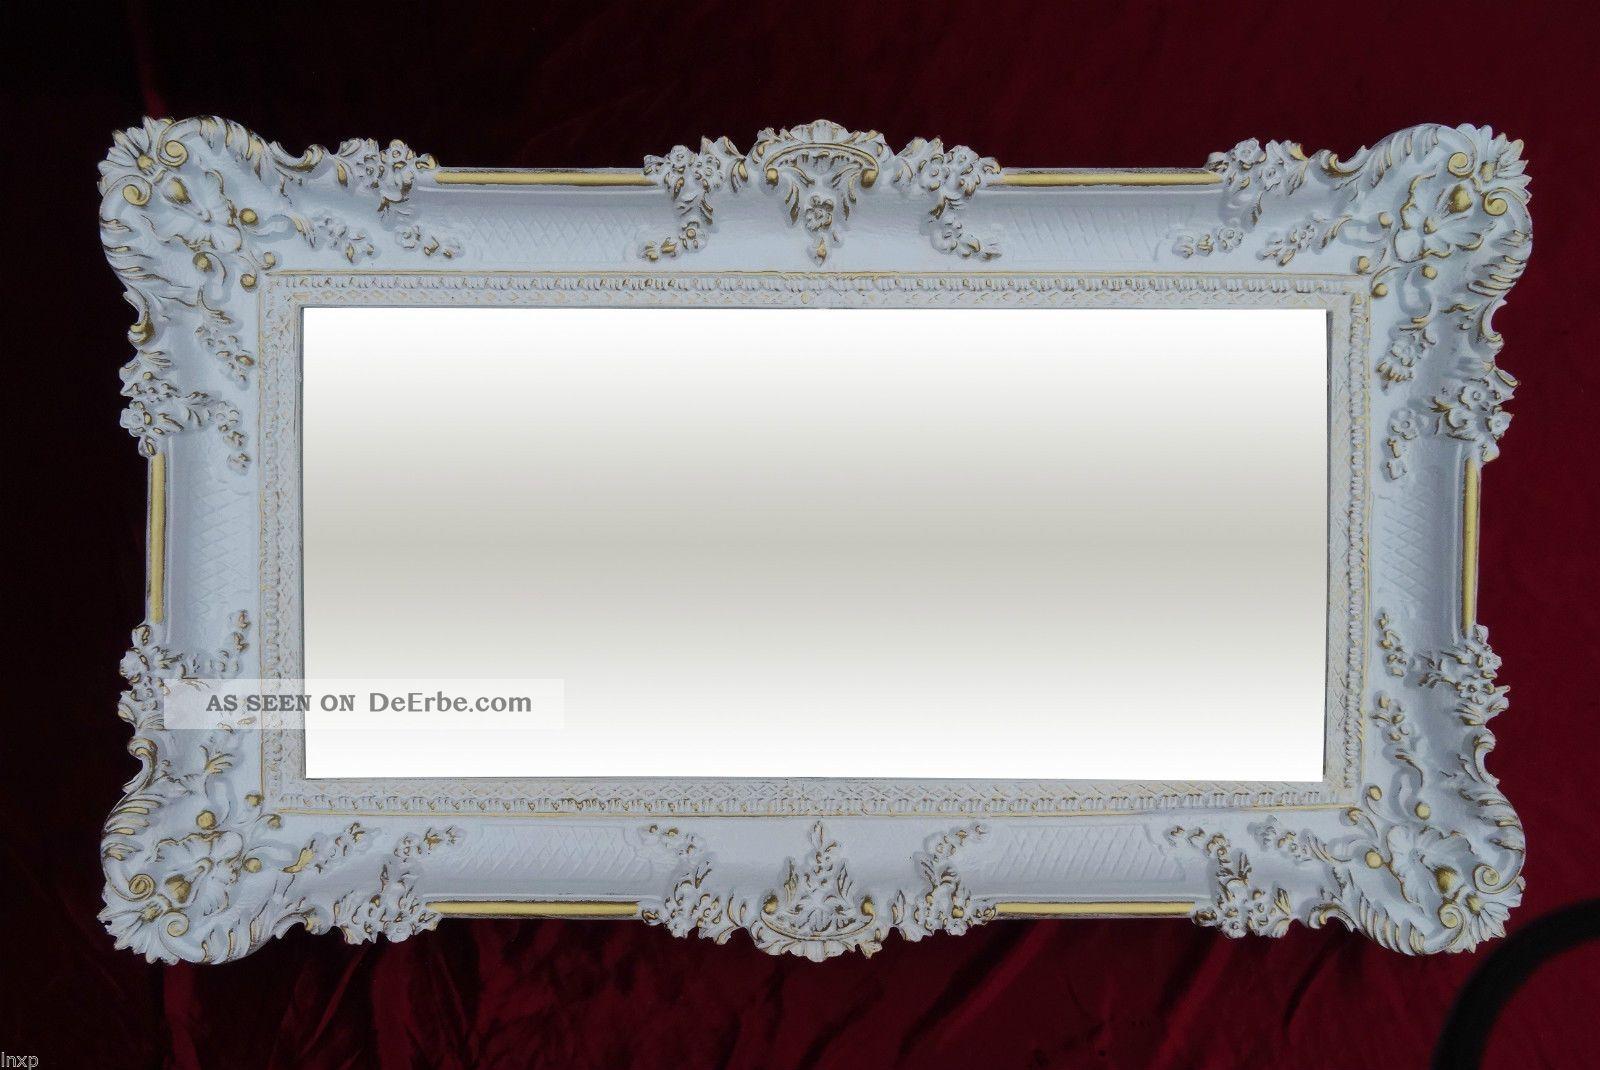 Wandspiegel wei gold 96x57 barock spiegel wanddeko shabby chic retro design 3 - Spiegel wanddeko ...